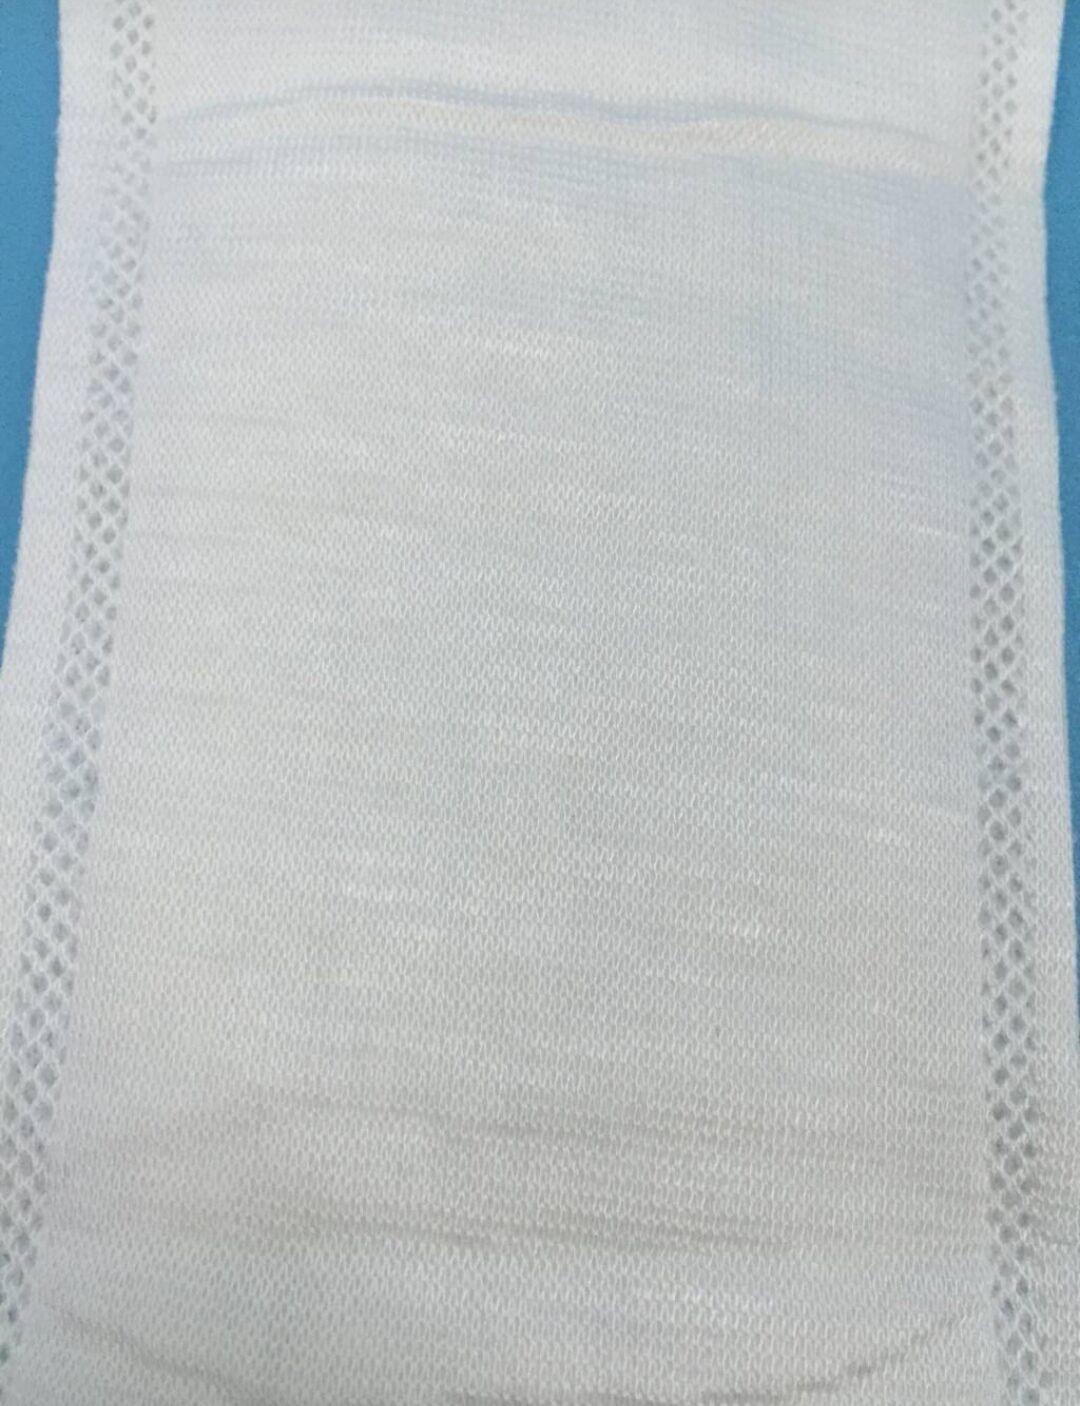 Panpansoft, Uni4star, 180mm With Wings Organic Cotton Panty Liners Factory